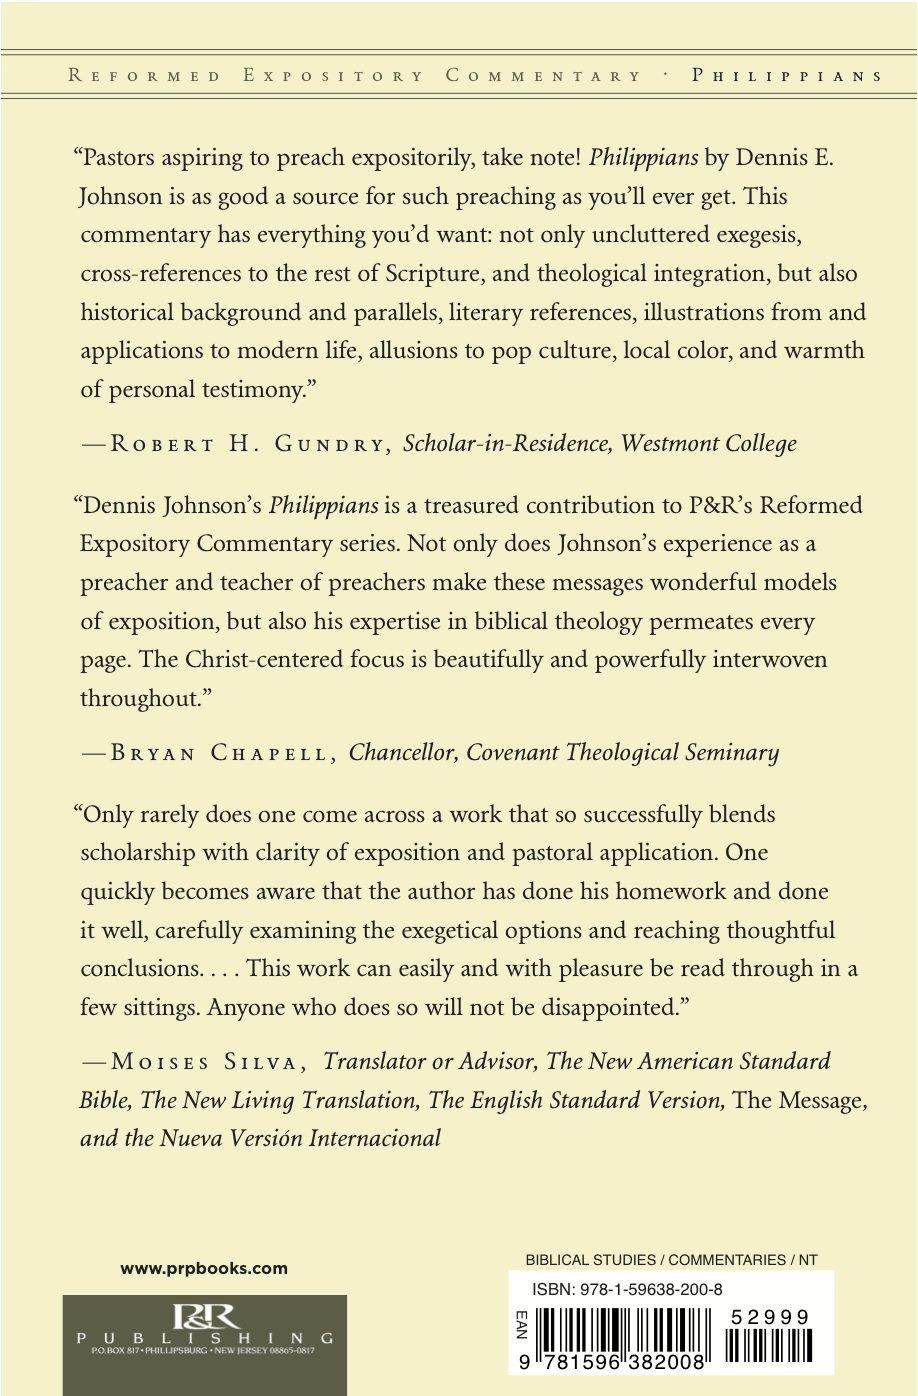 Philippians (Reformed Expository Commentary): Dennis E. Johnson:  9781596382008: Amazon.com: Books